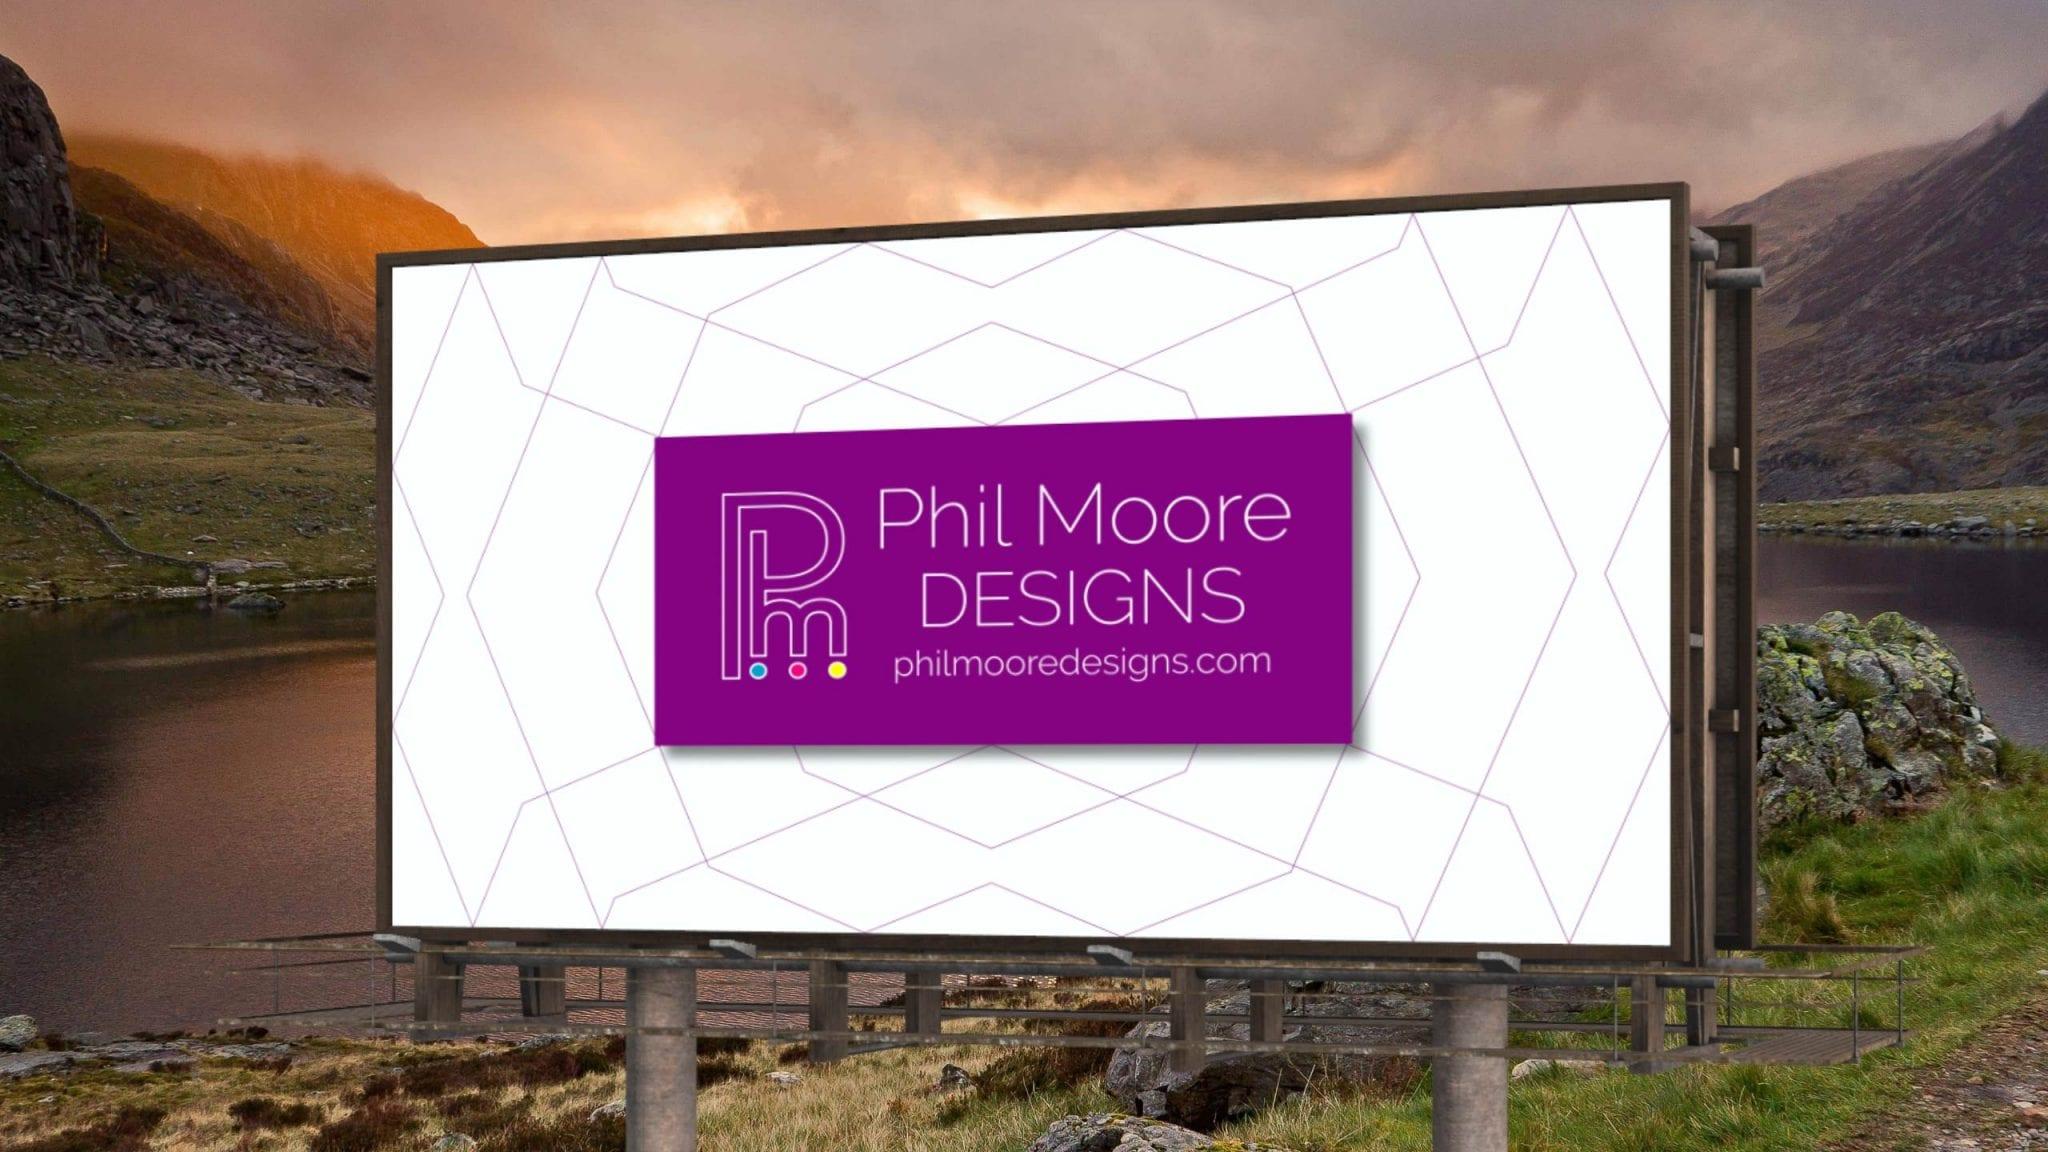 Phil Moore Designs